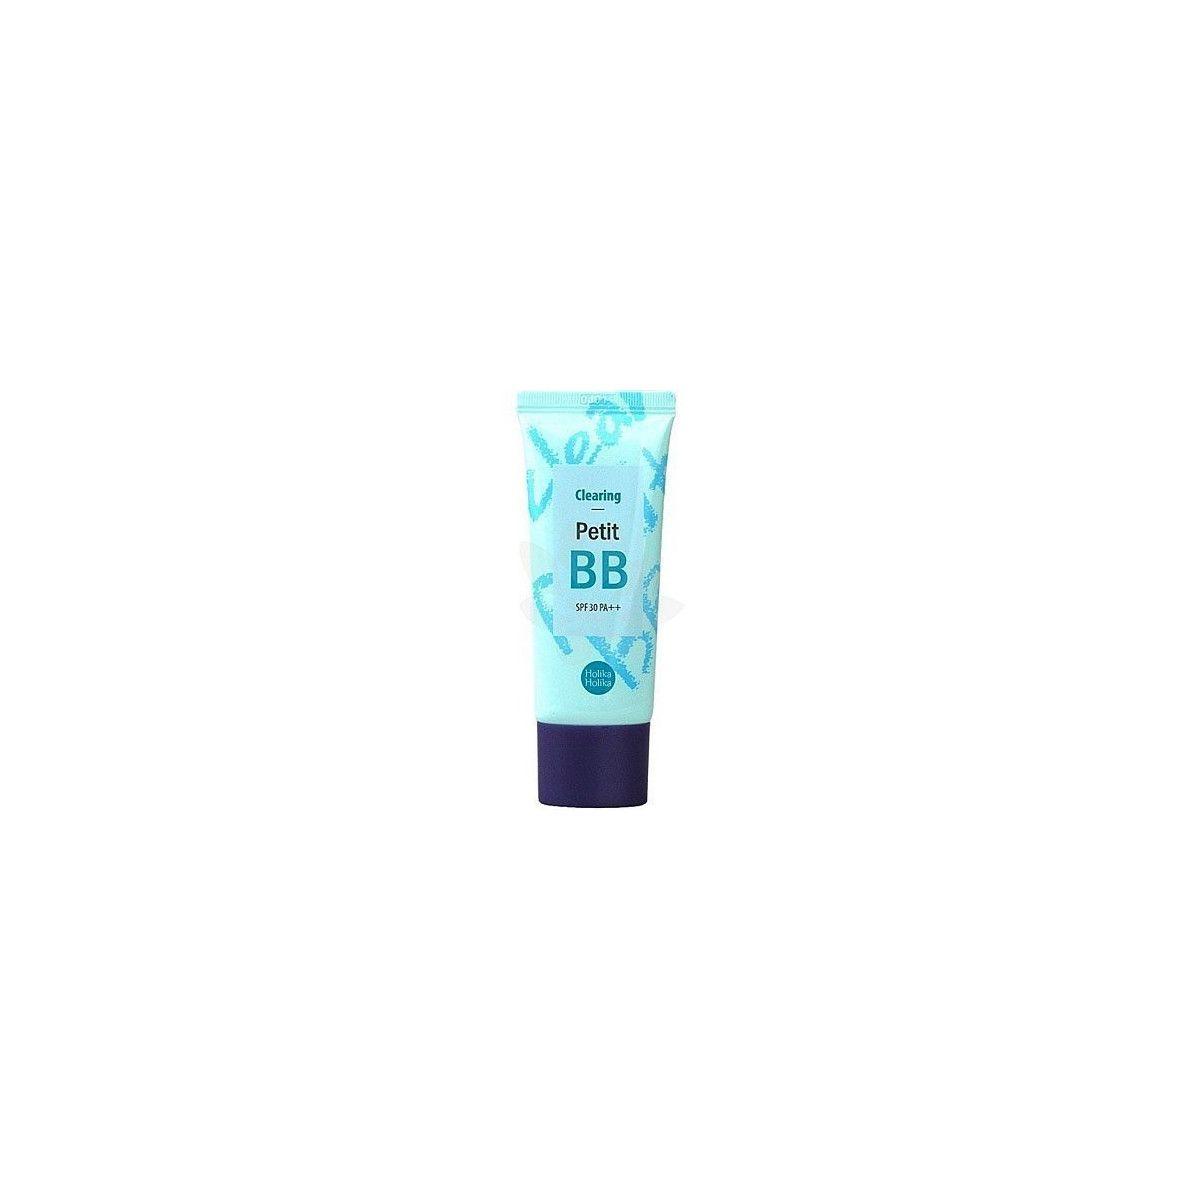 Holika Holika Clearing Petit BB SPF 30 PA++, oczyszczający krem z filtrem do skóry 30ml